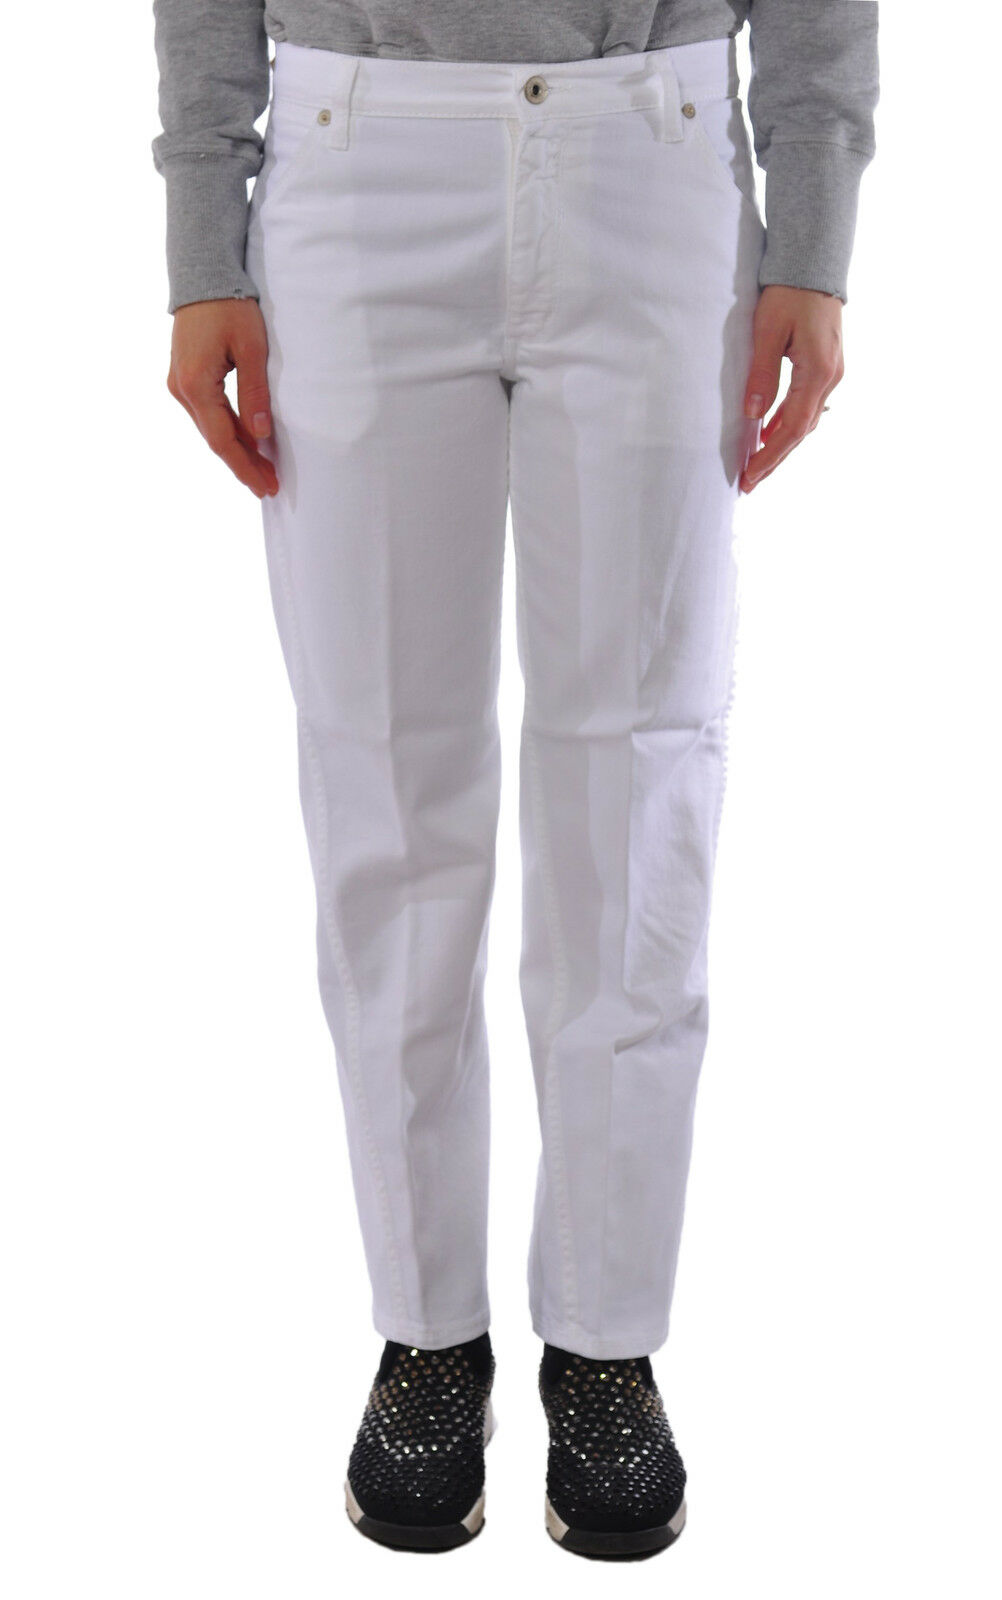 Dondup  -  Pants - Female - 25 - White - 1321304B162436